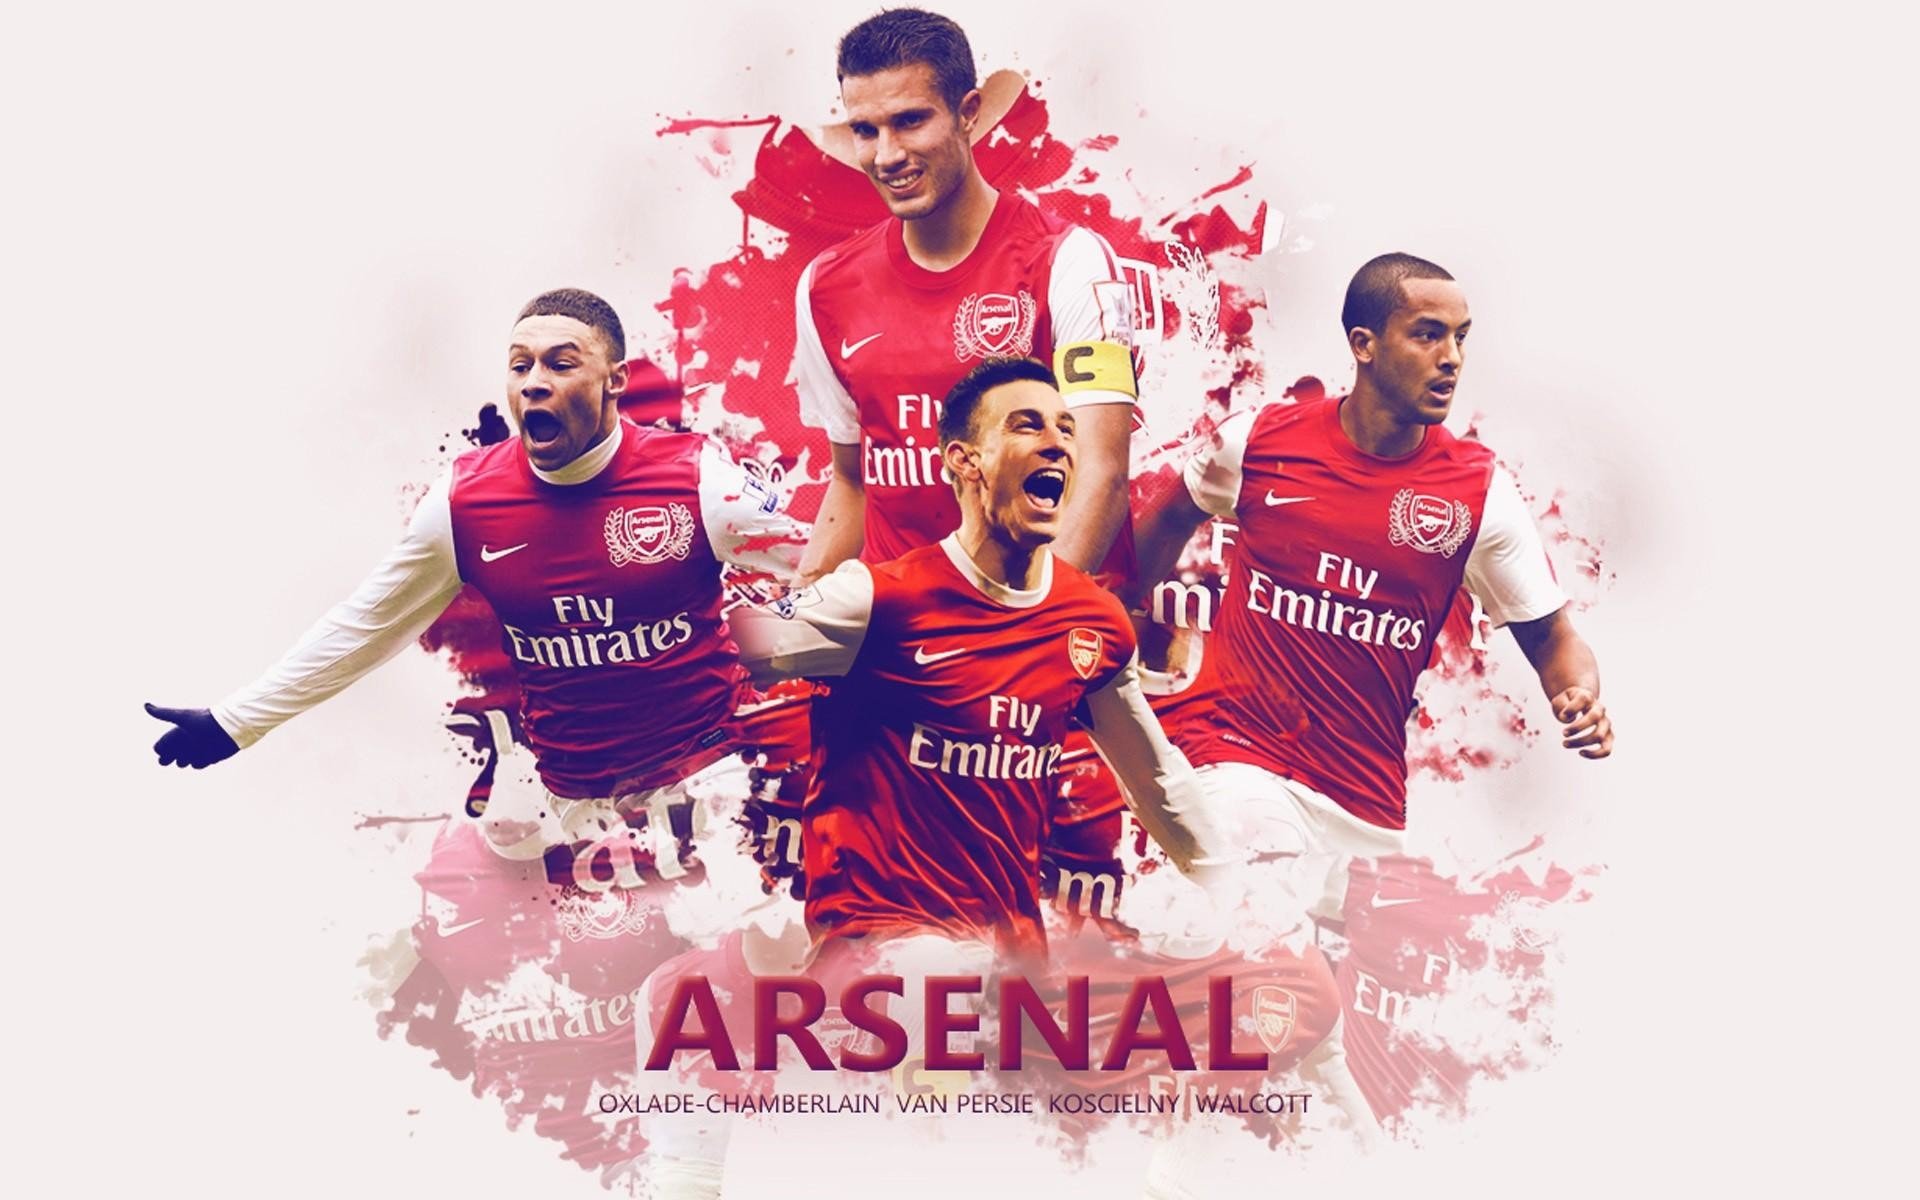 Arsenal Fc Wallpaper 2018 ① Wallpapertag